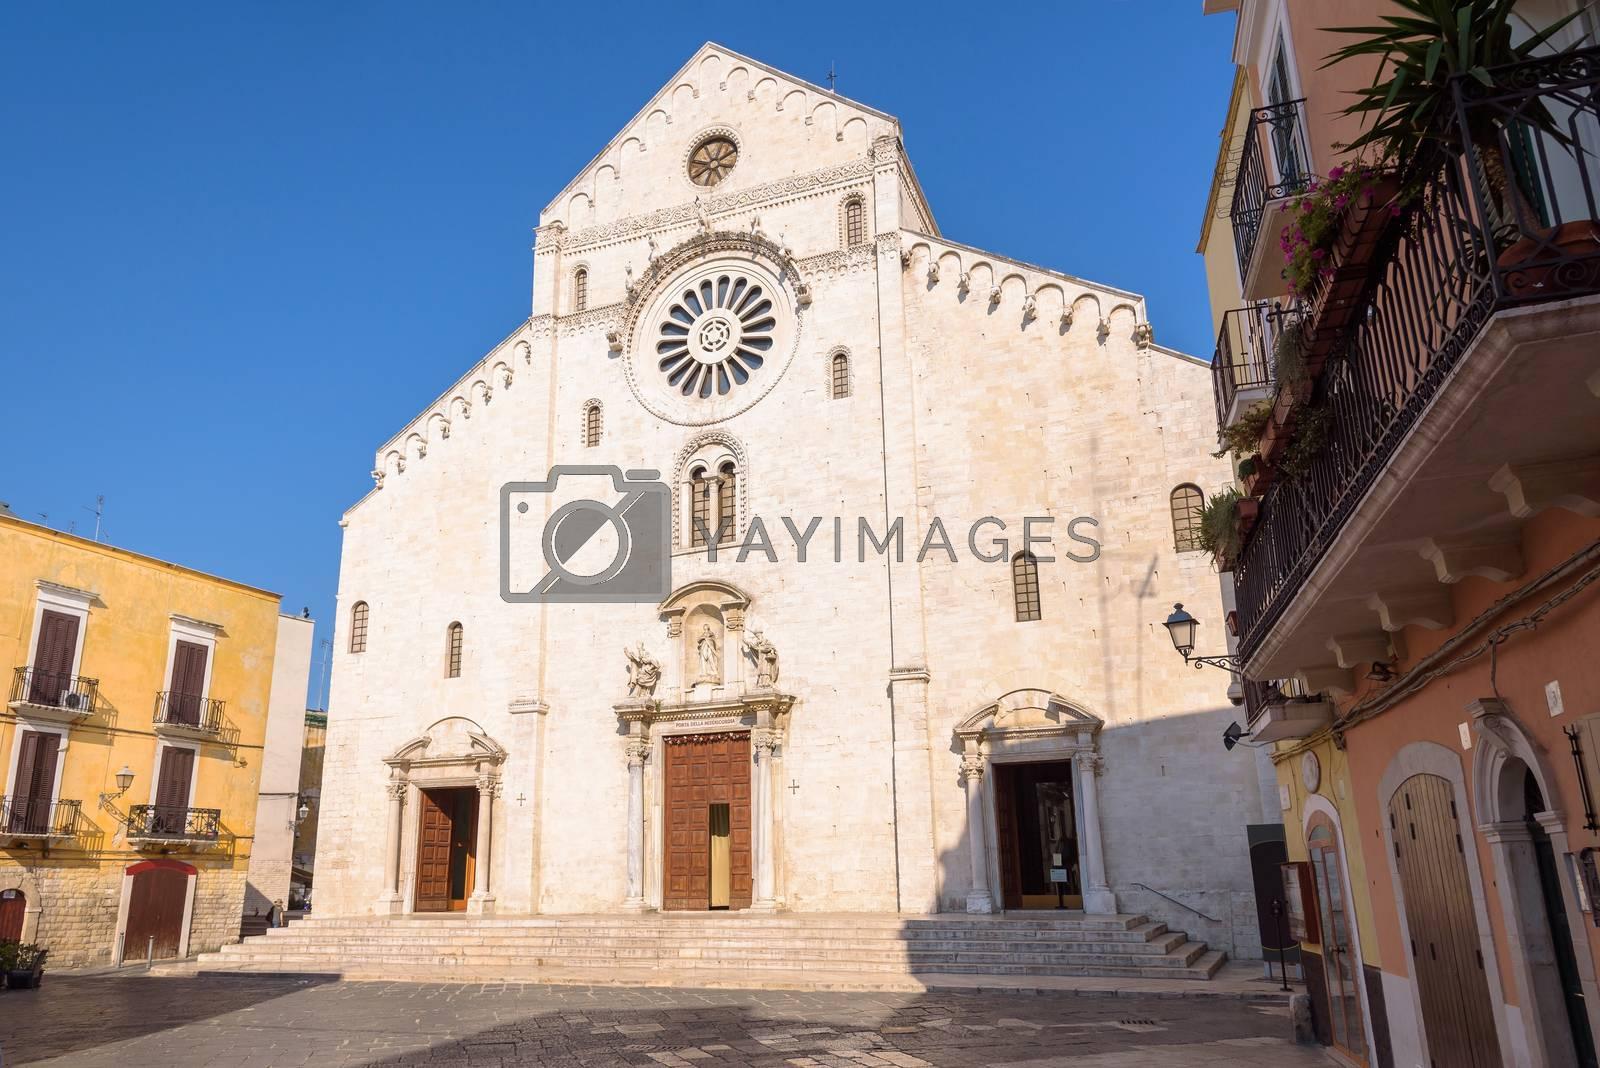 Facade of the Cathedral of San Sabino in Bari, Apulia, Italy